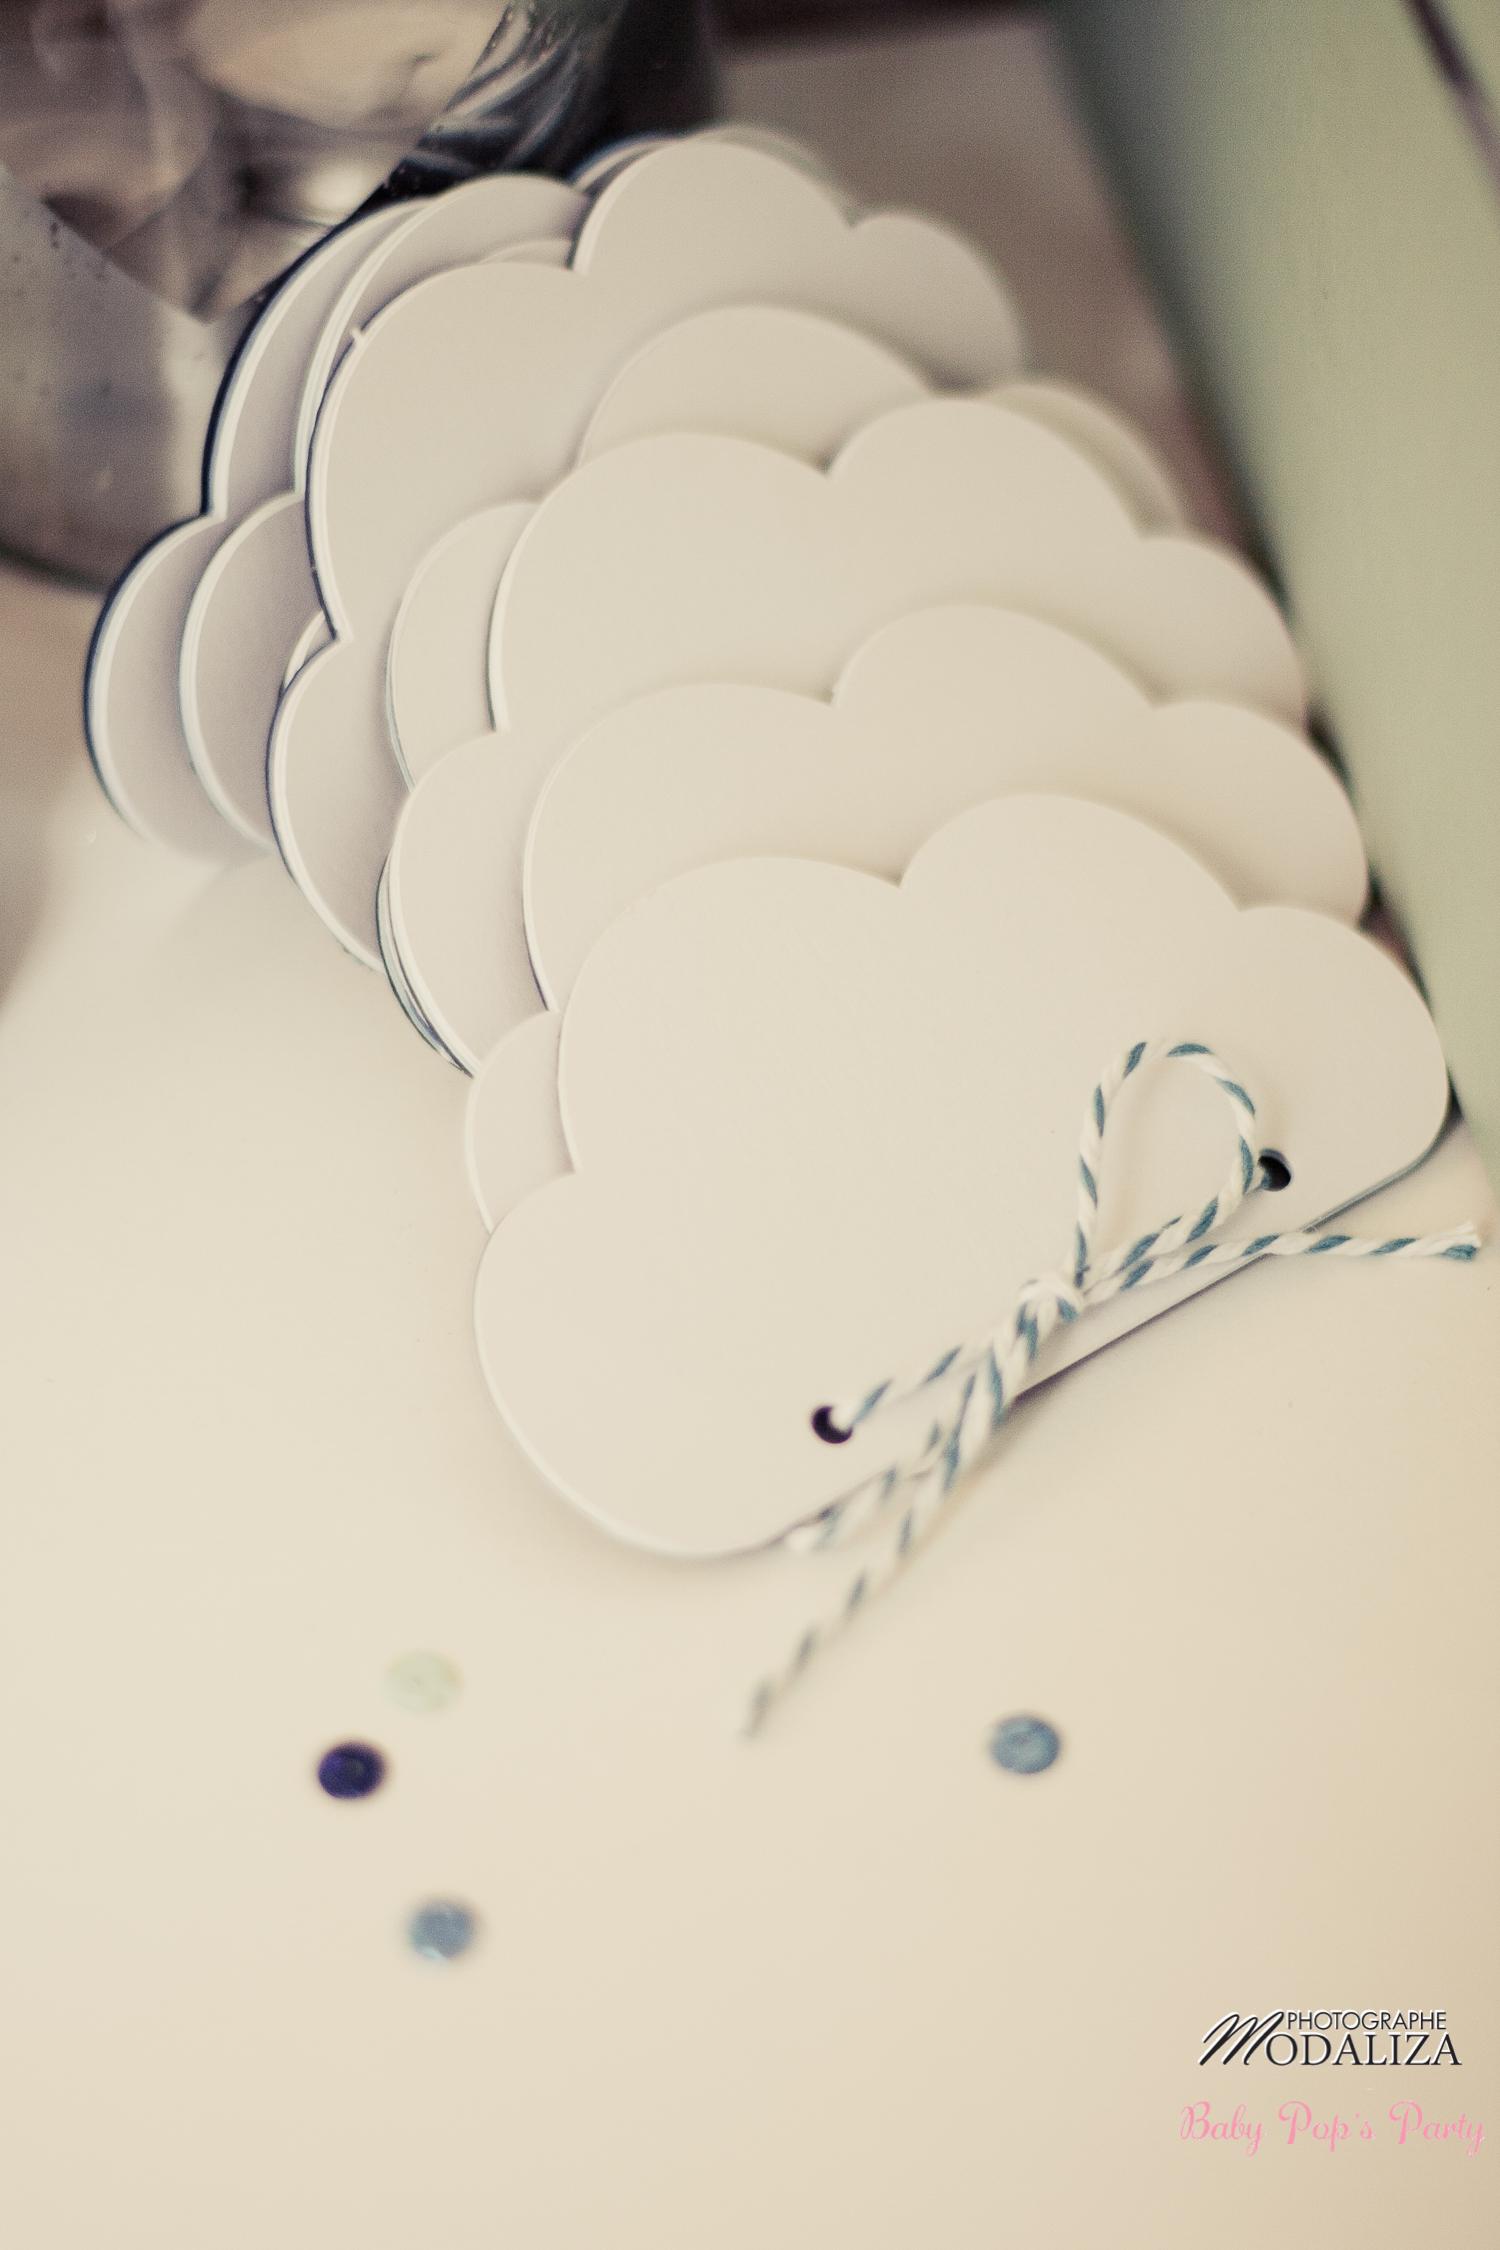 Babyshower bleu nuages baby pop's party by modaliza photographe-6869